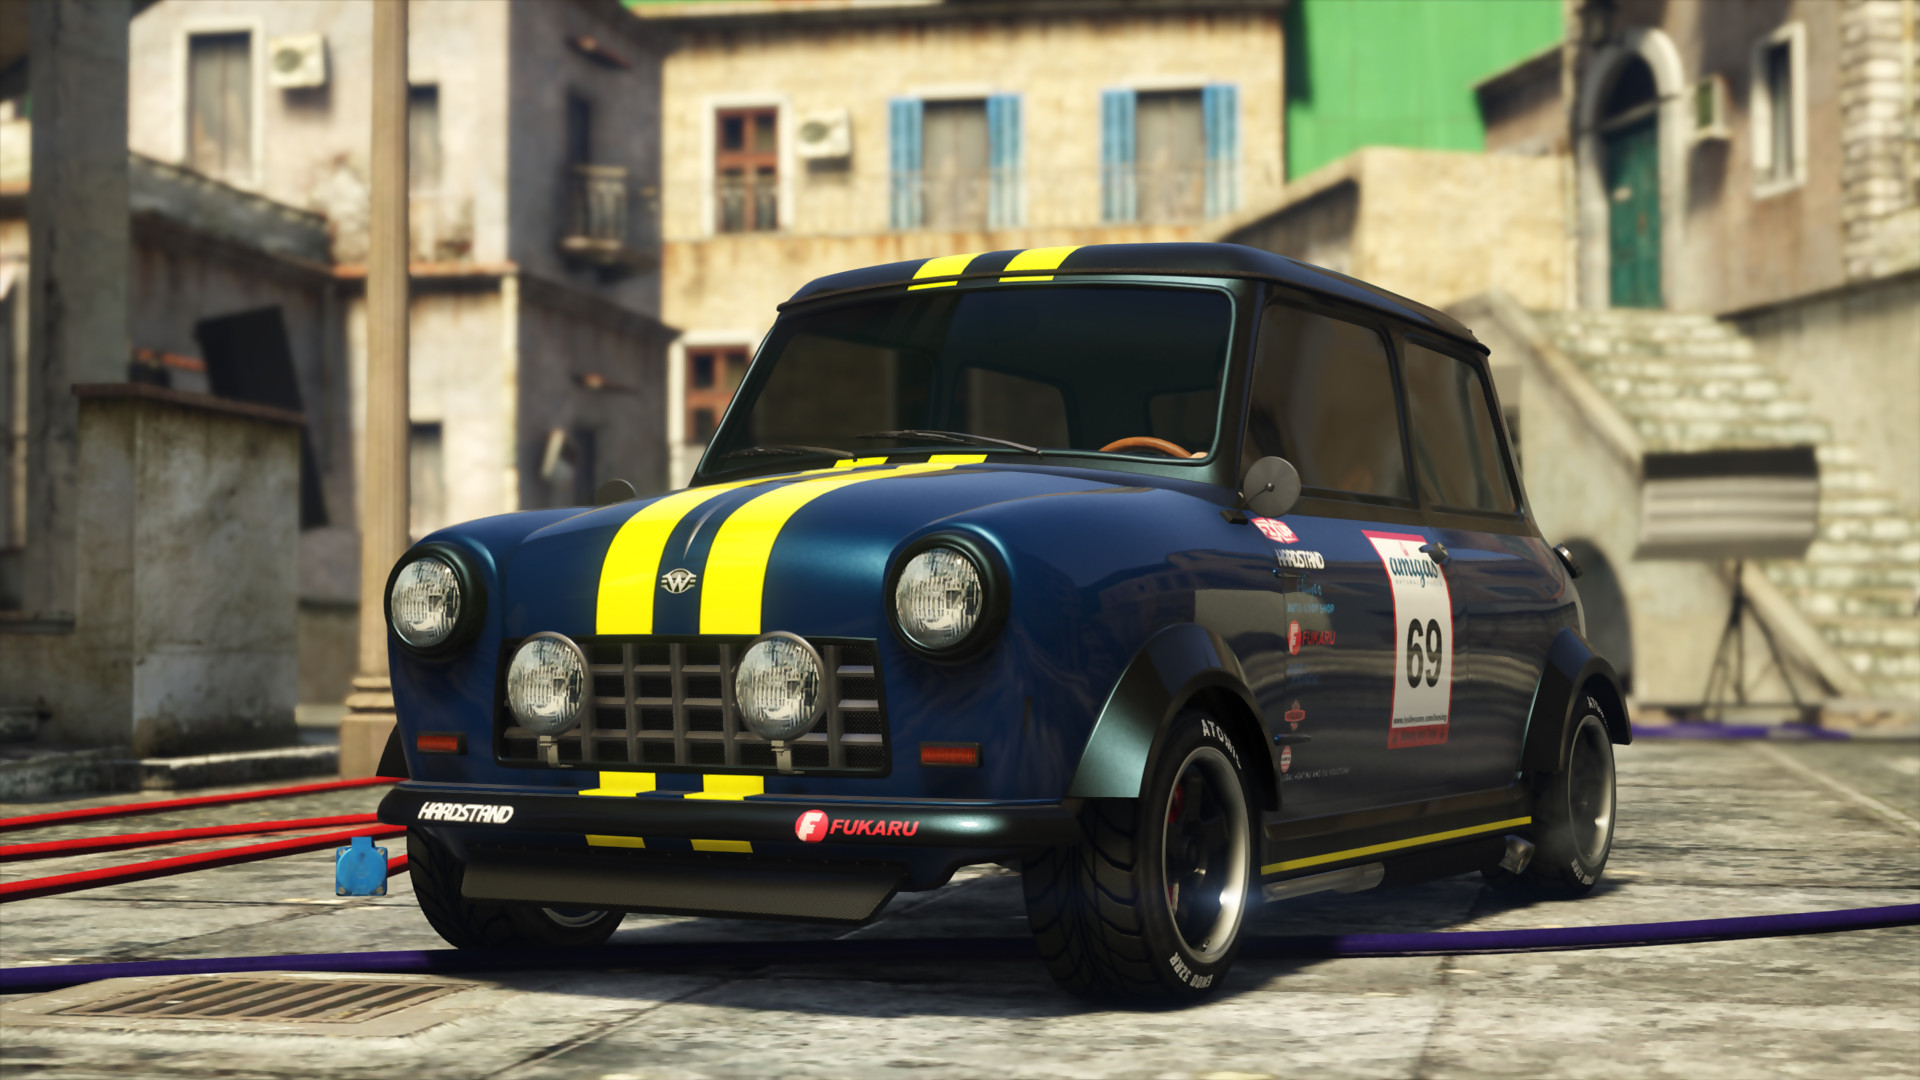 Gta 5 trailer de gameplay la braquage l 39 italienne for Voiture garage gta 5 mode histoire